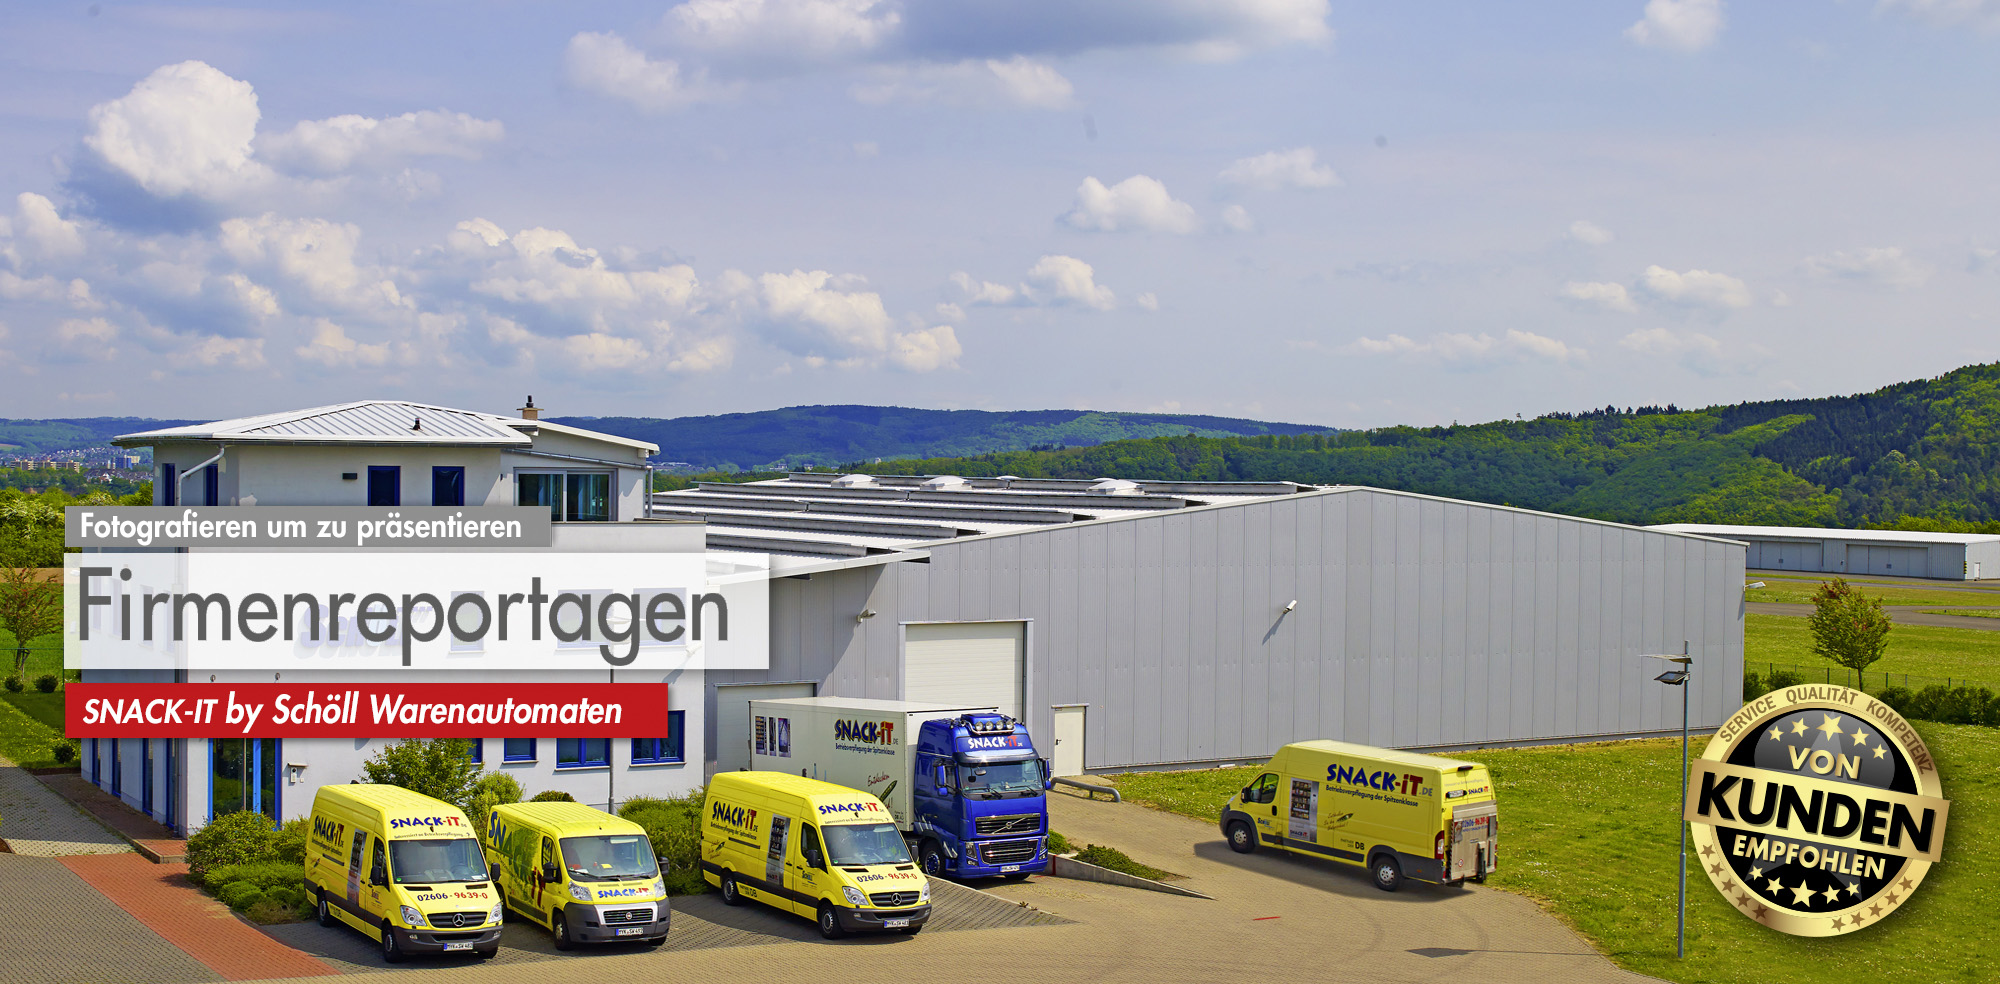 Panoramafotografie, Industriefotografie und Werbefotografie @ BlickFang2 Fotostudio, Filmstudio in Weinheim und Andernach, Fotograf